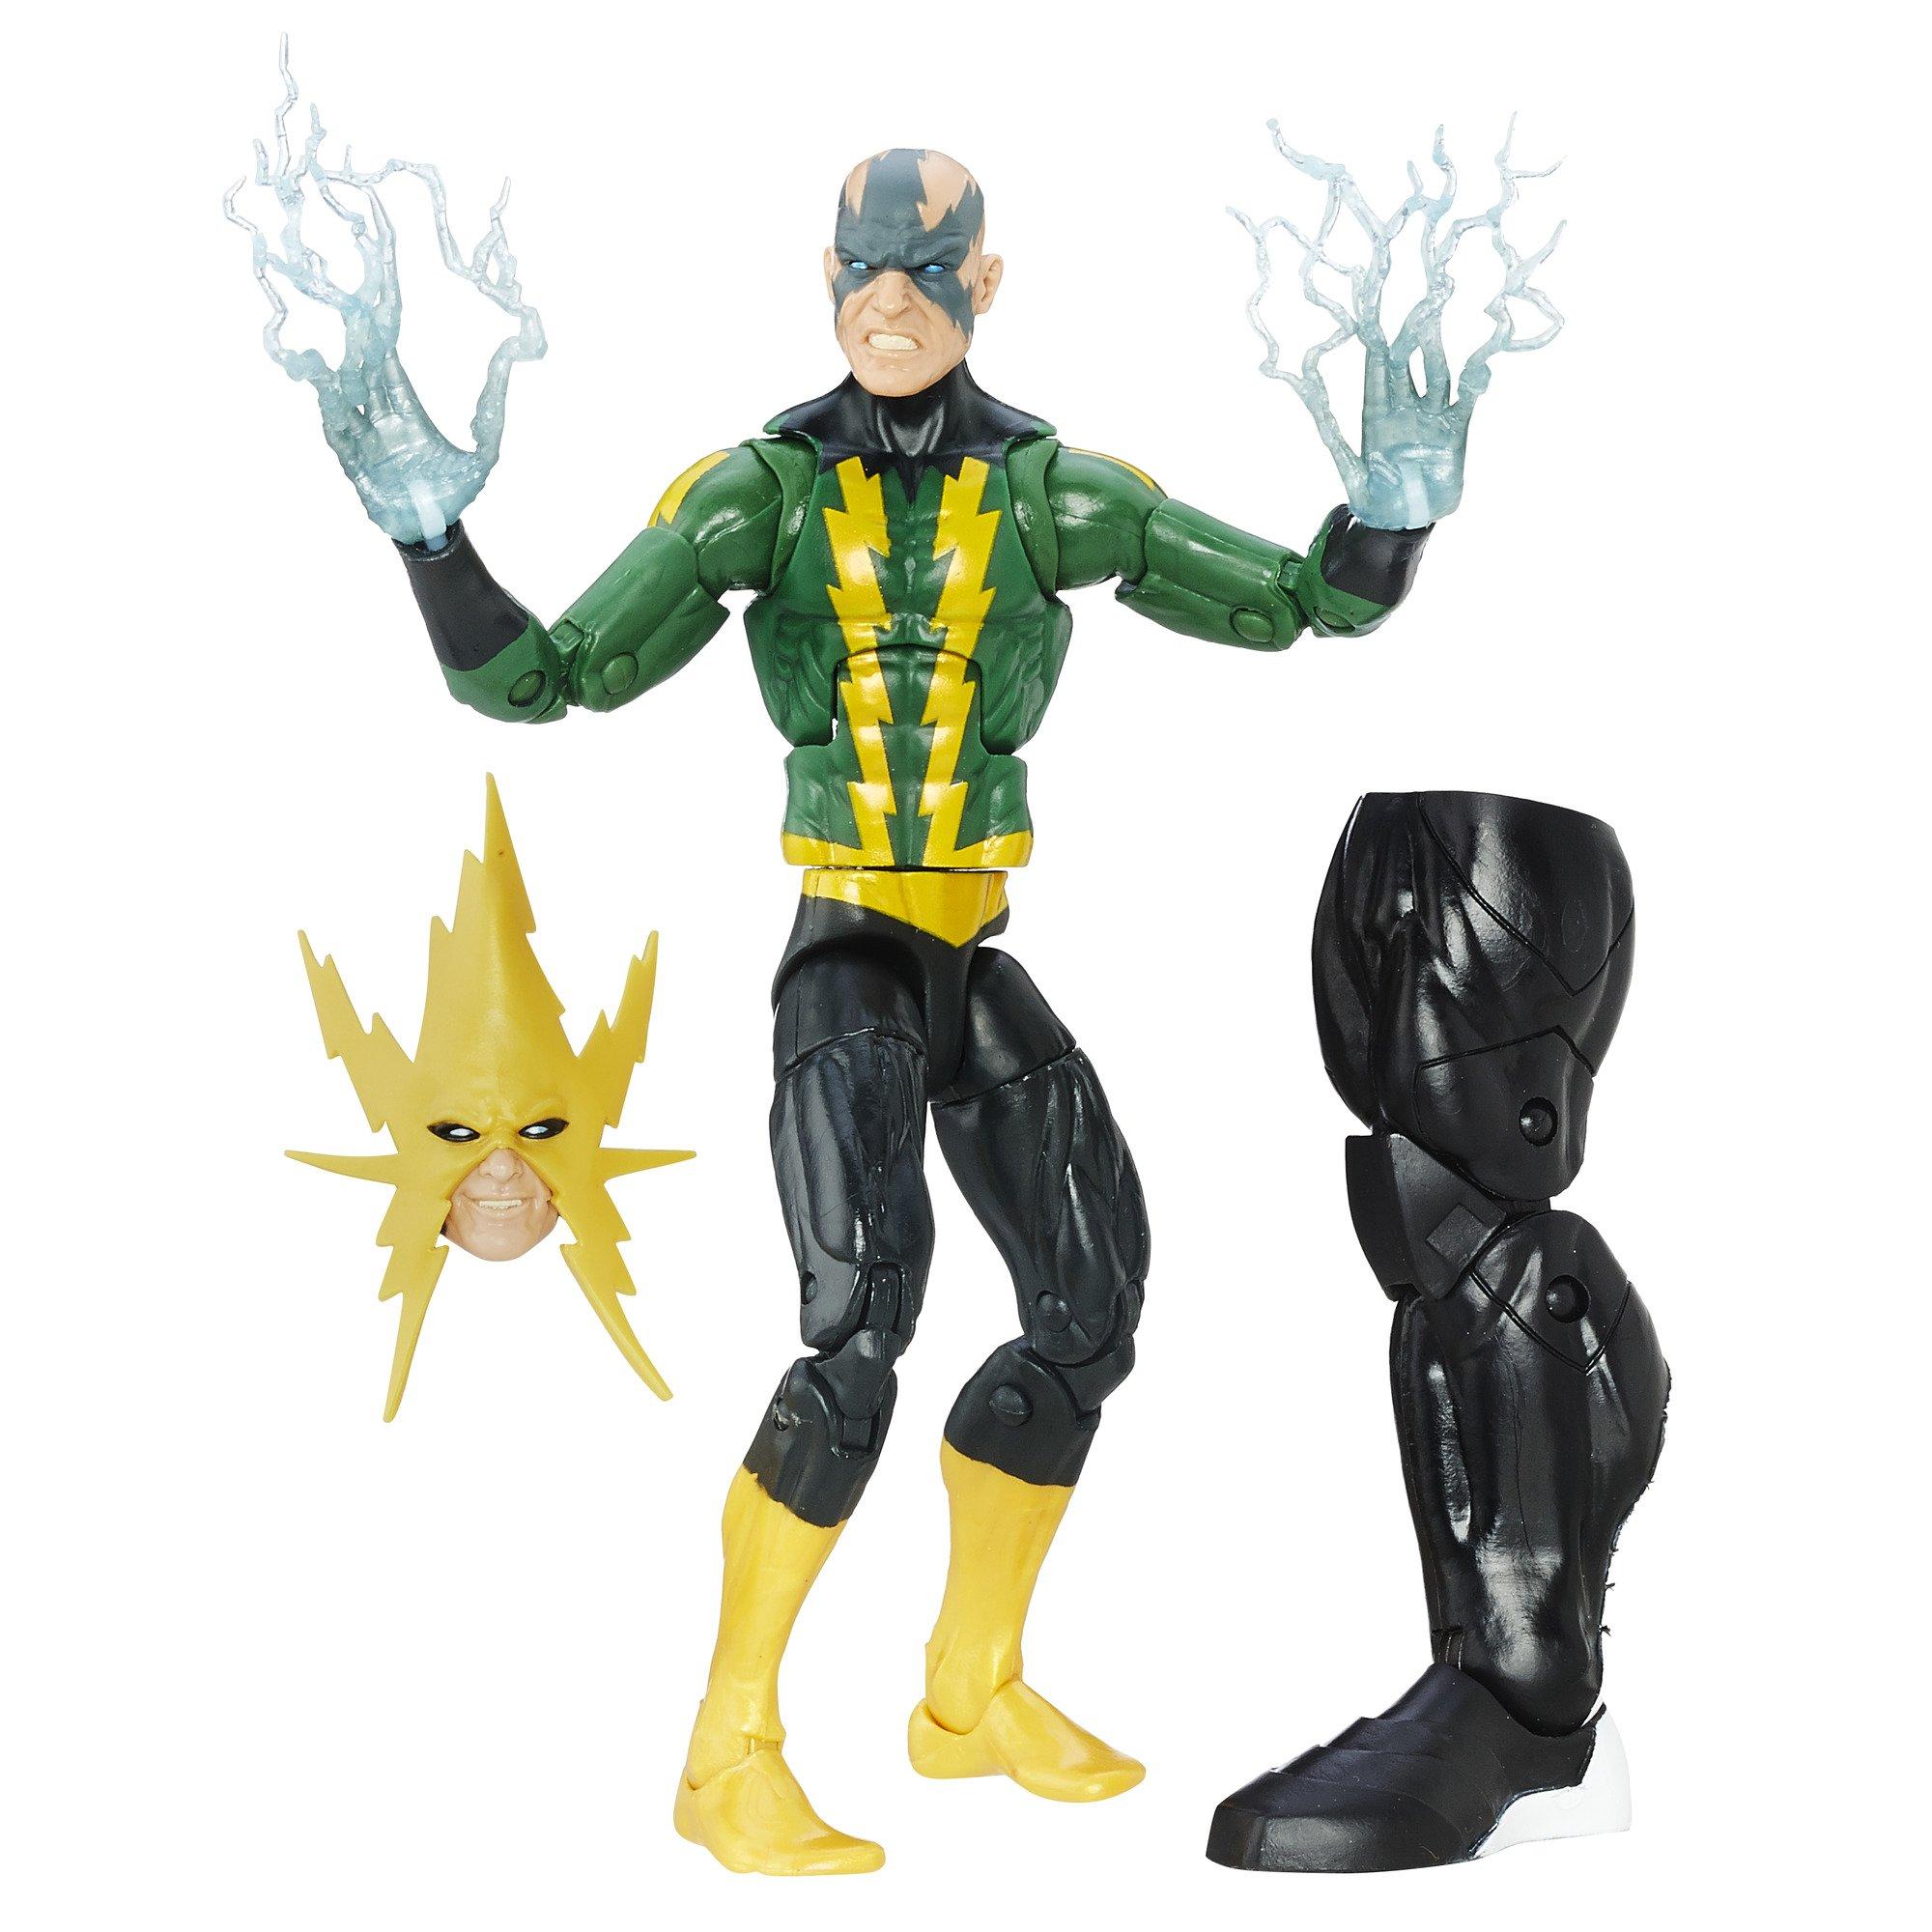 Marvel Spider-Man 6-inch Legends Series Evil Adversaries: Marvel's Electro